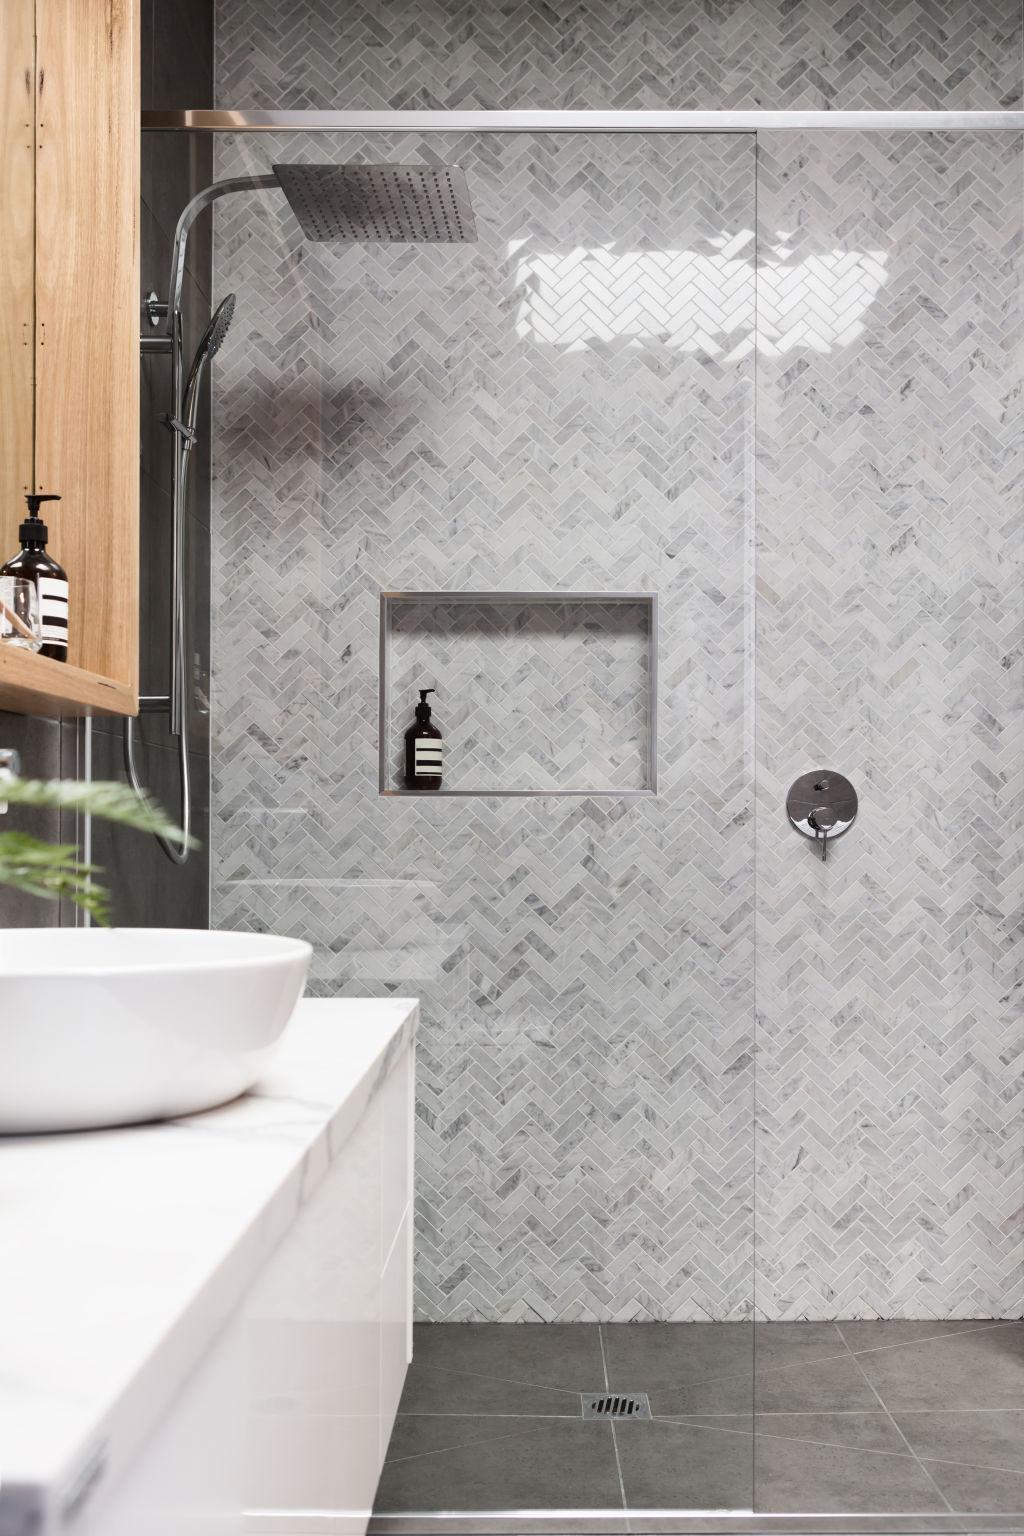 Rain shower with luxury herringbone marble feature tile wall.